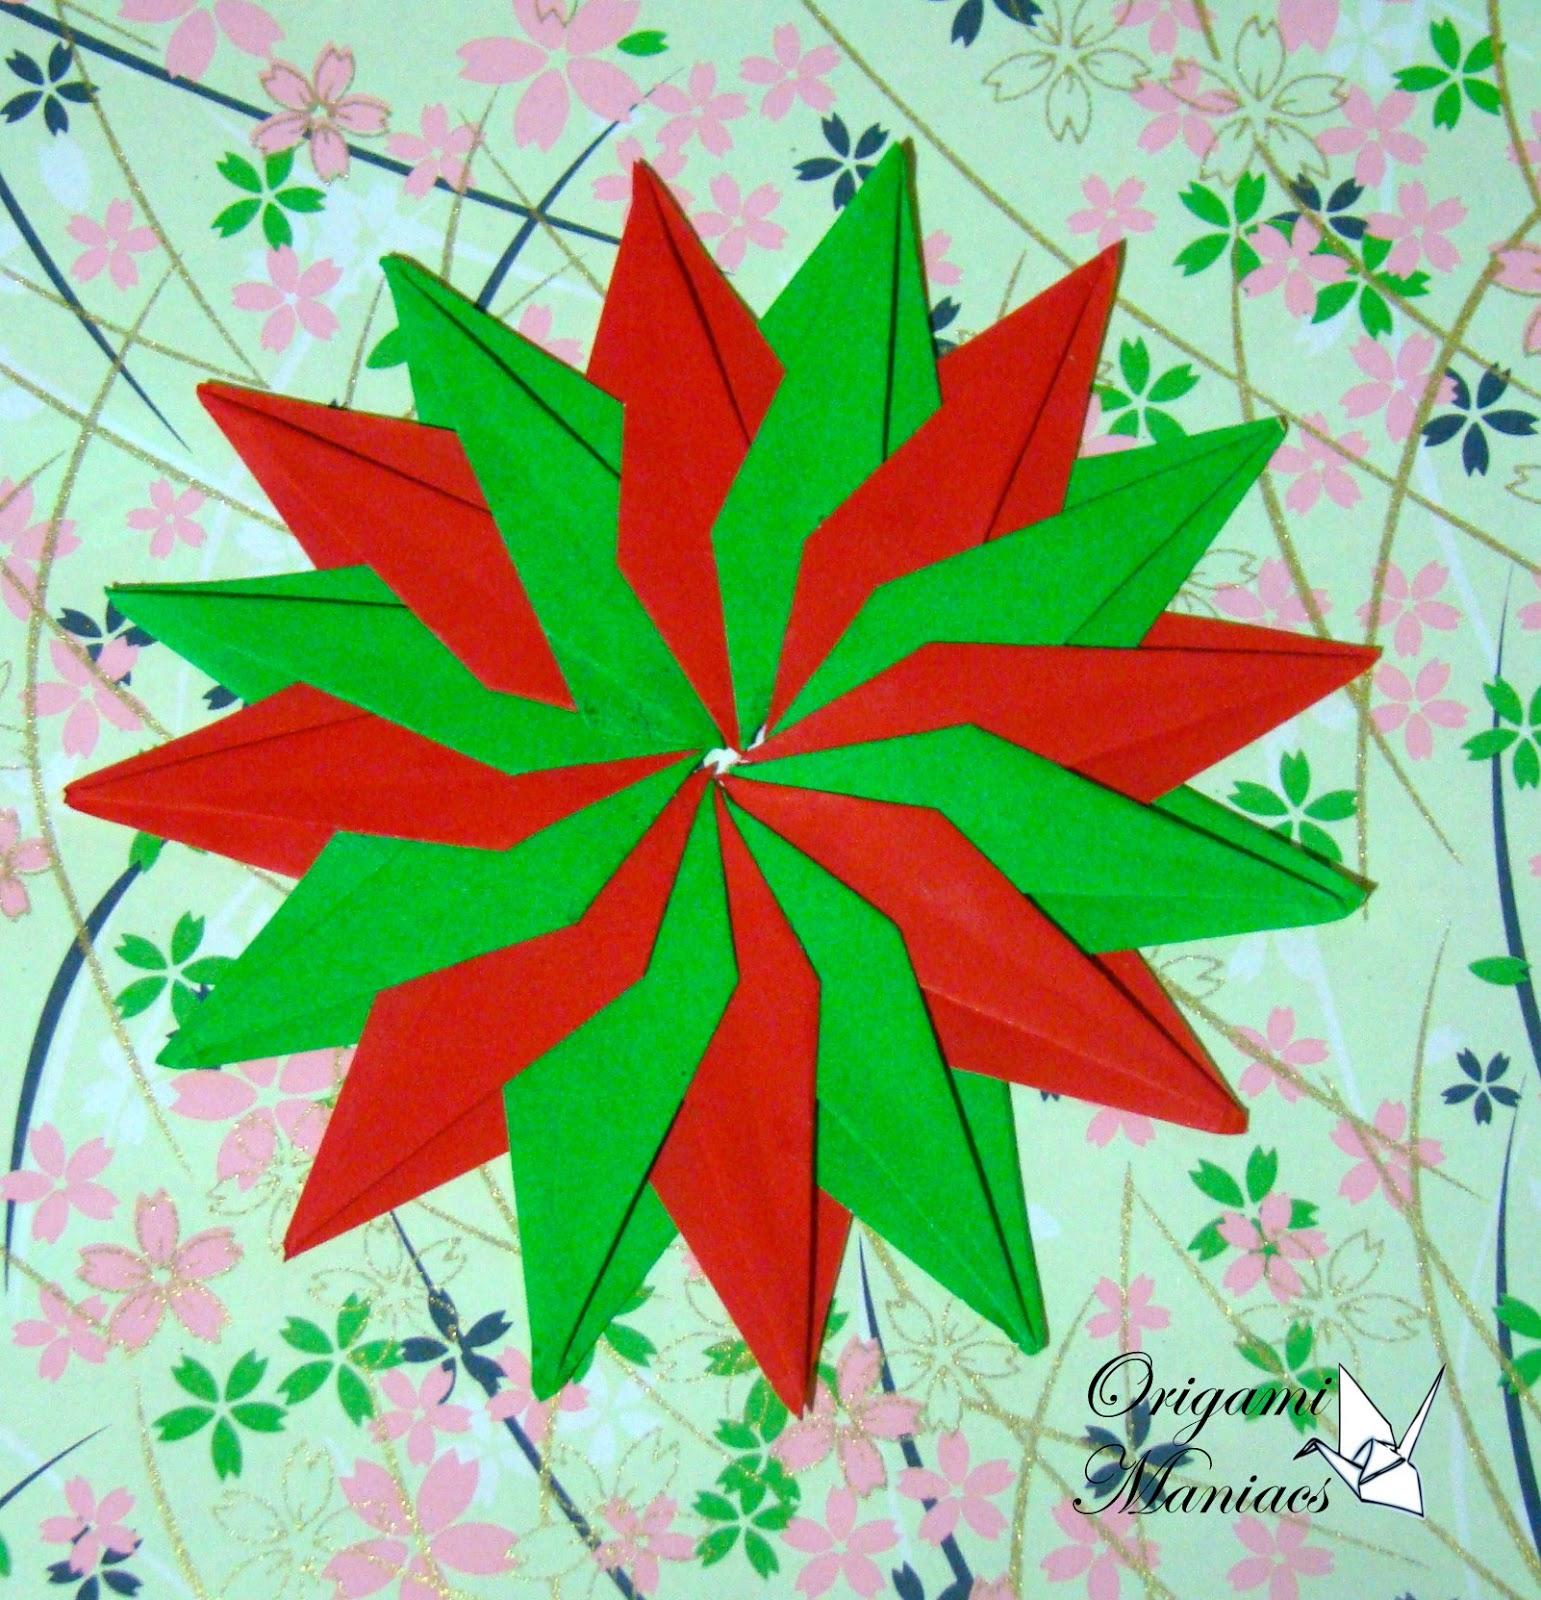 Origami Maniacs: Origami Mandalas for Christmas Trees ... - photo#10